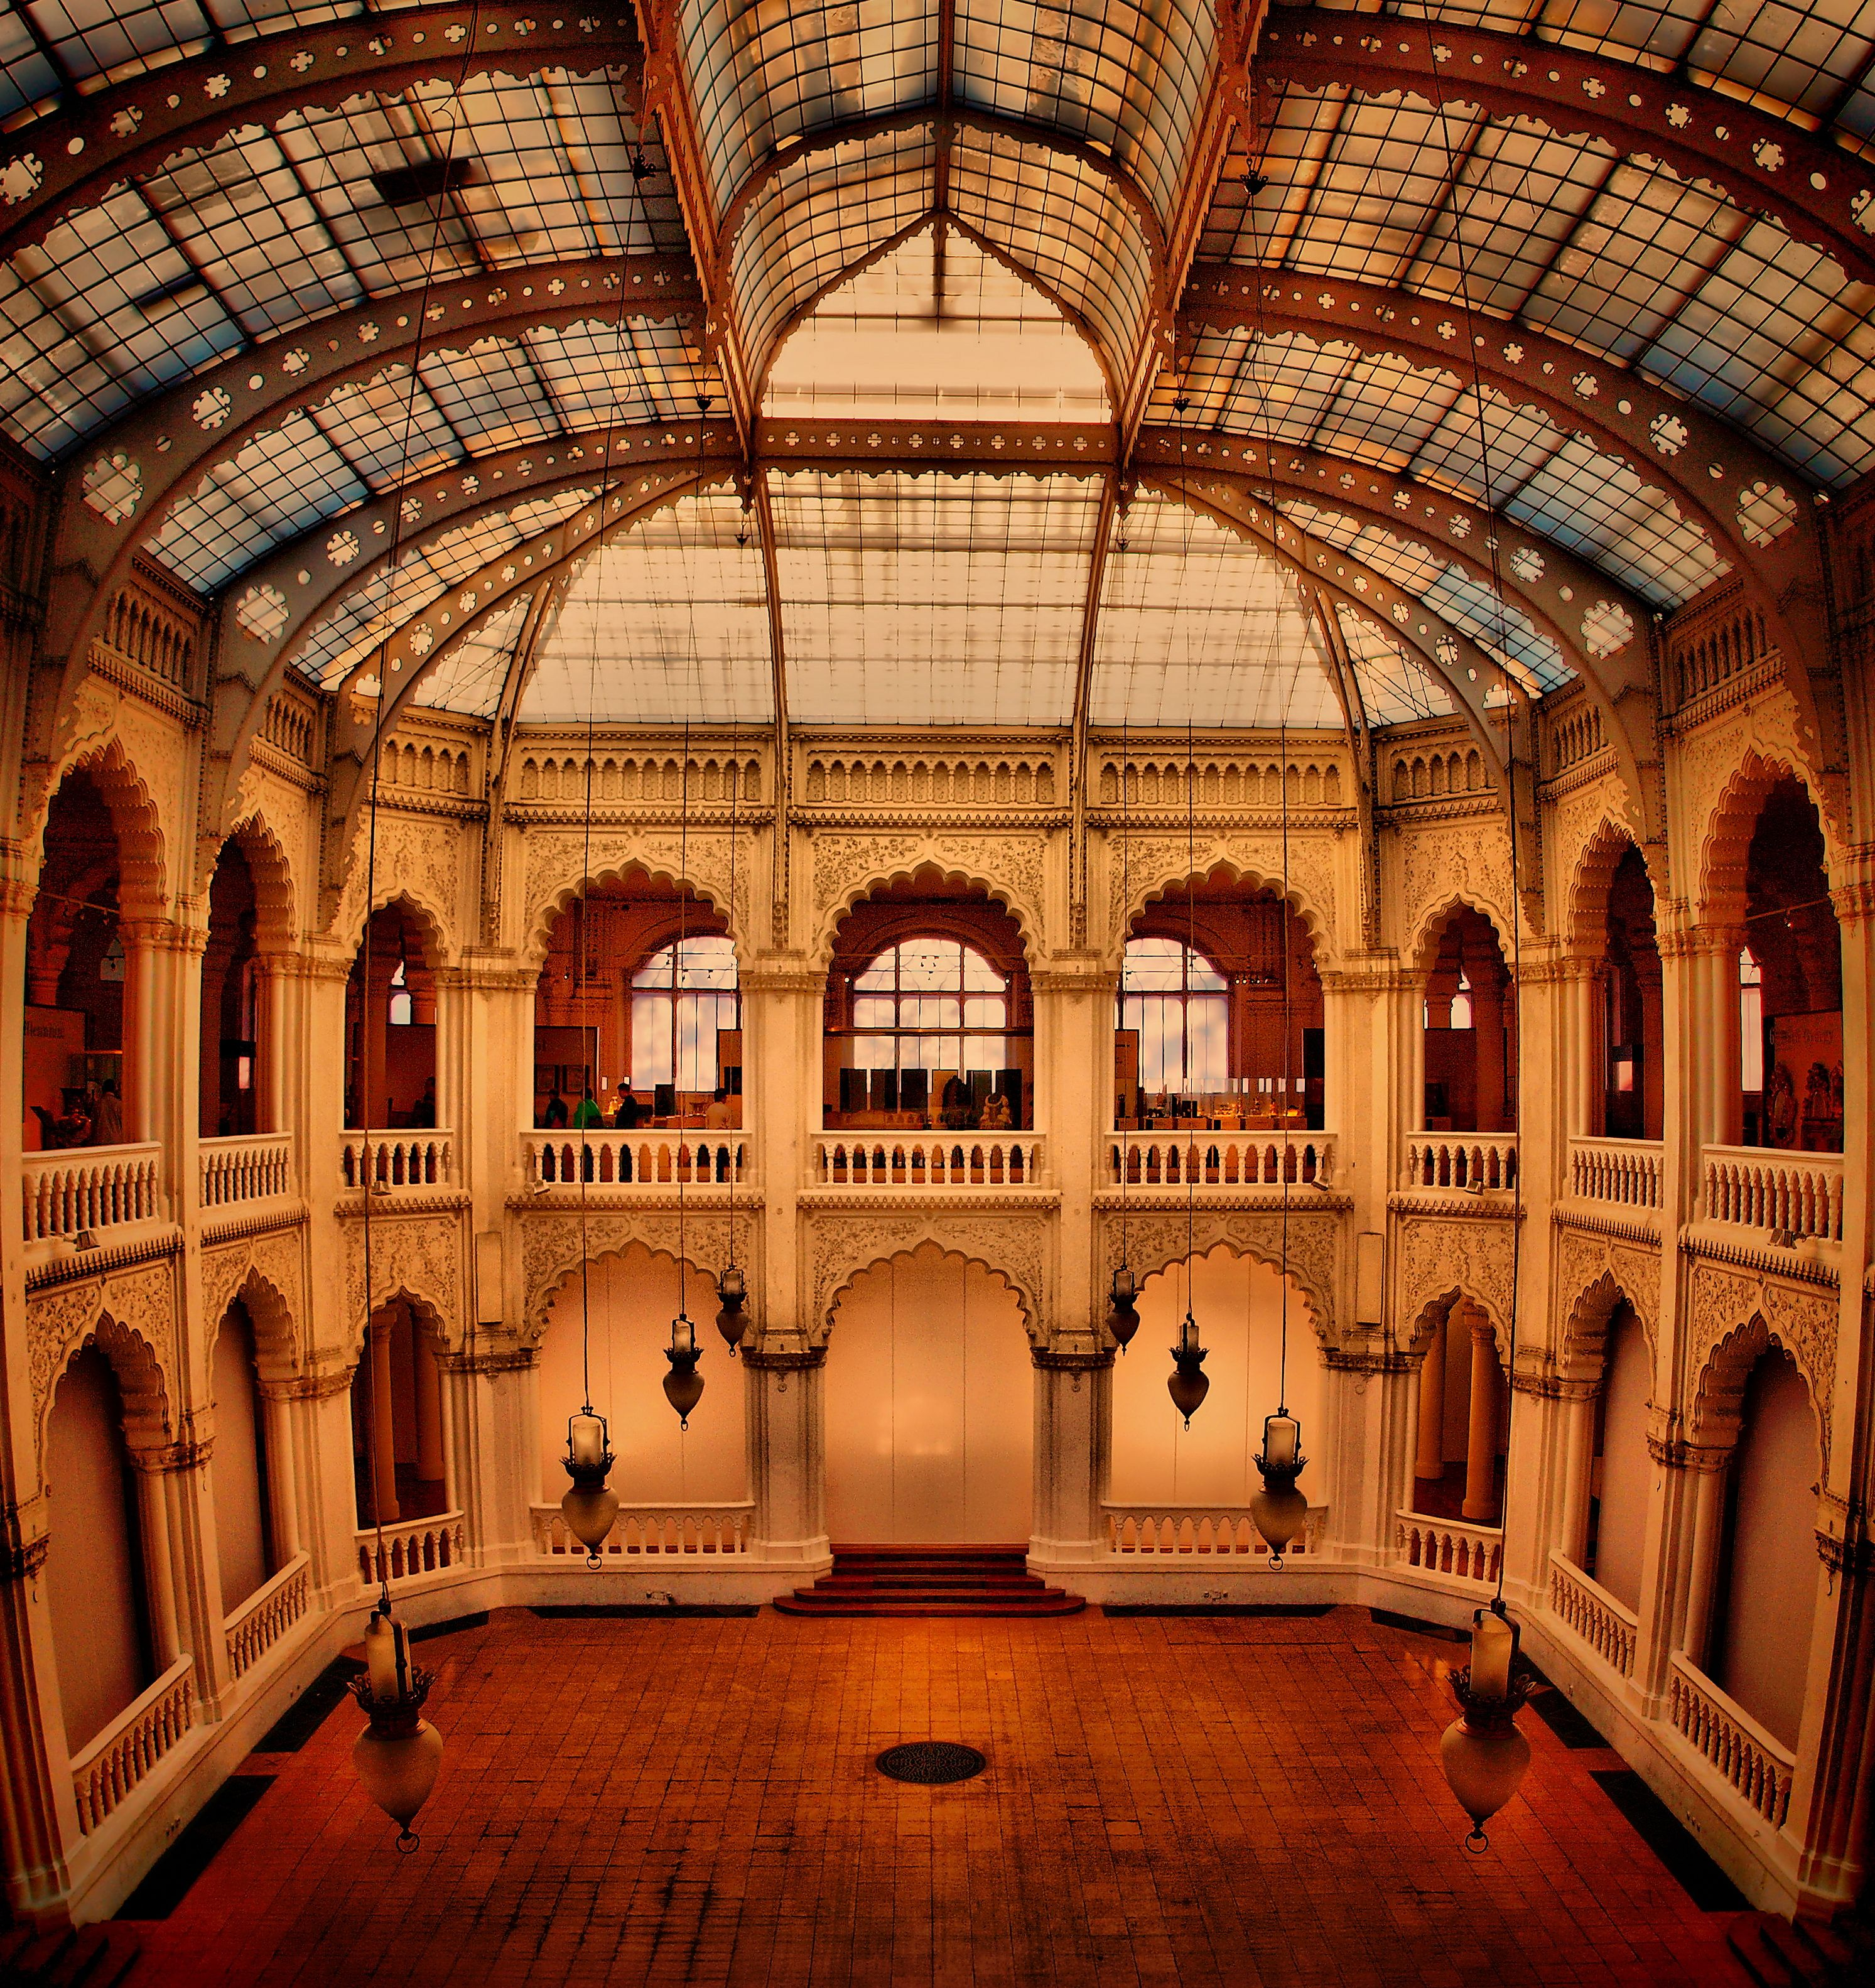 Museum Of Applied Arts In Budapest Art Nouveau Style Win Art Architecture Artists Art Nouveau